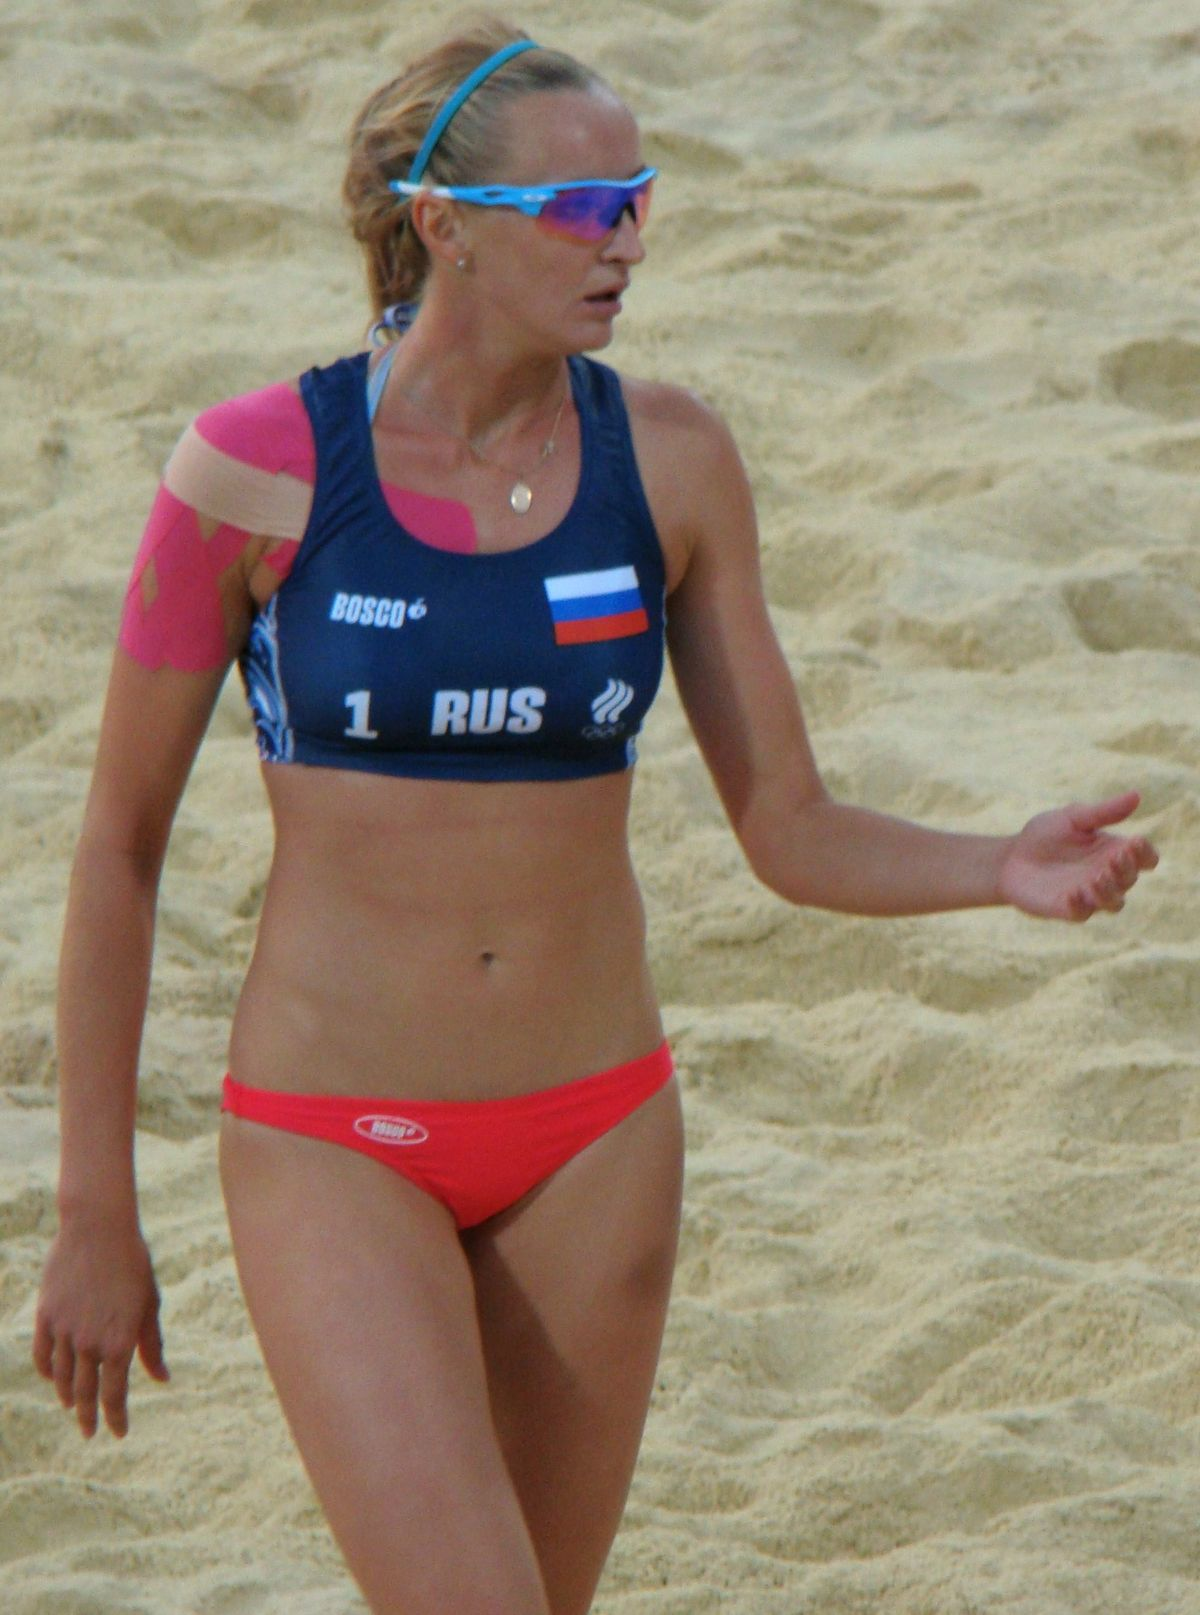 Ekaterina Birlova - Wikipedia: https://en.wikipedia.org/wiki/Ekaterina_Birlova